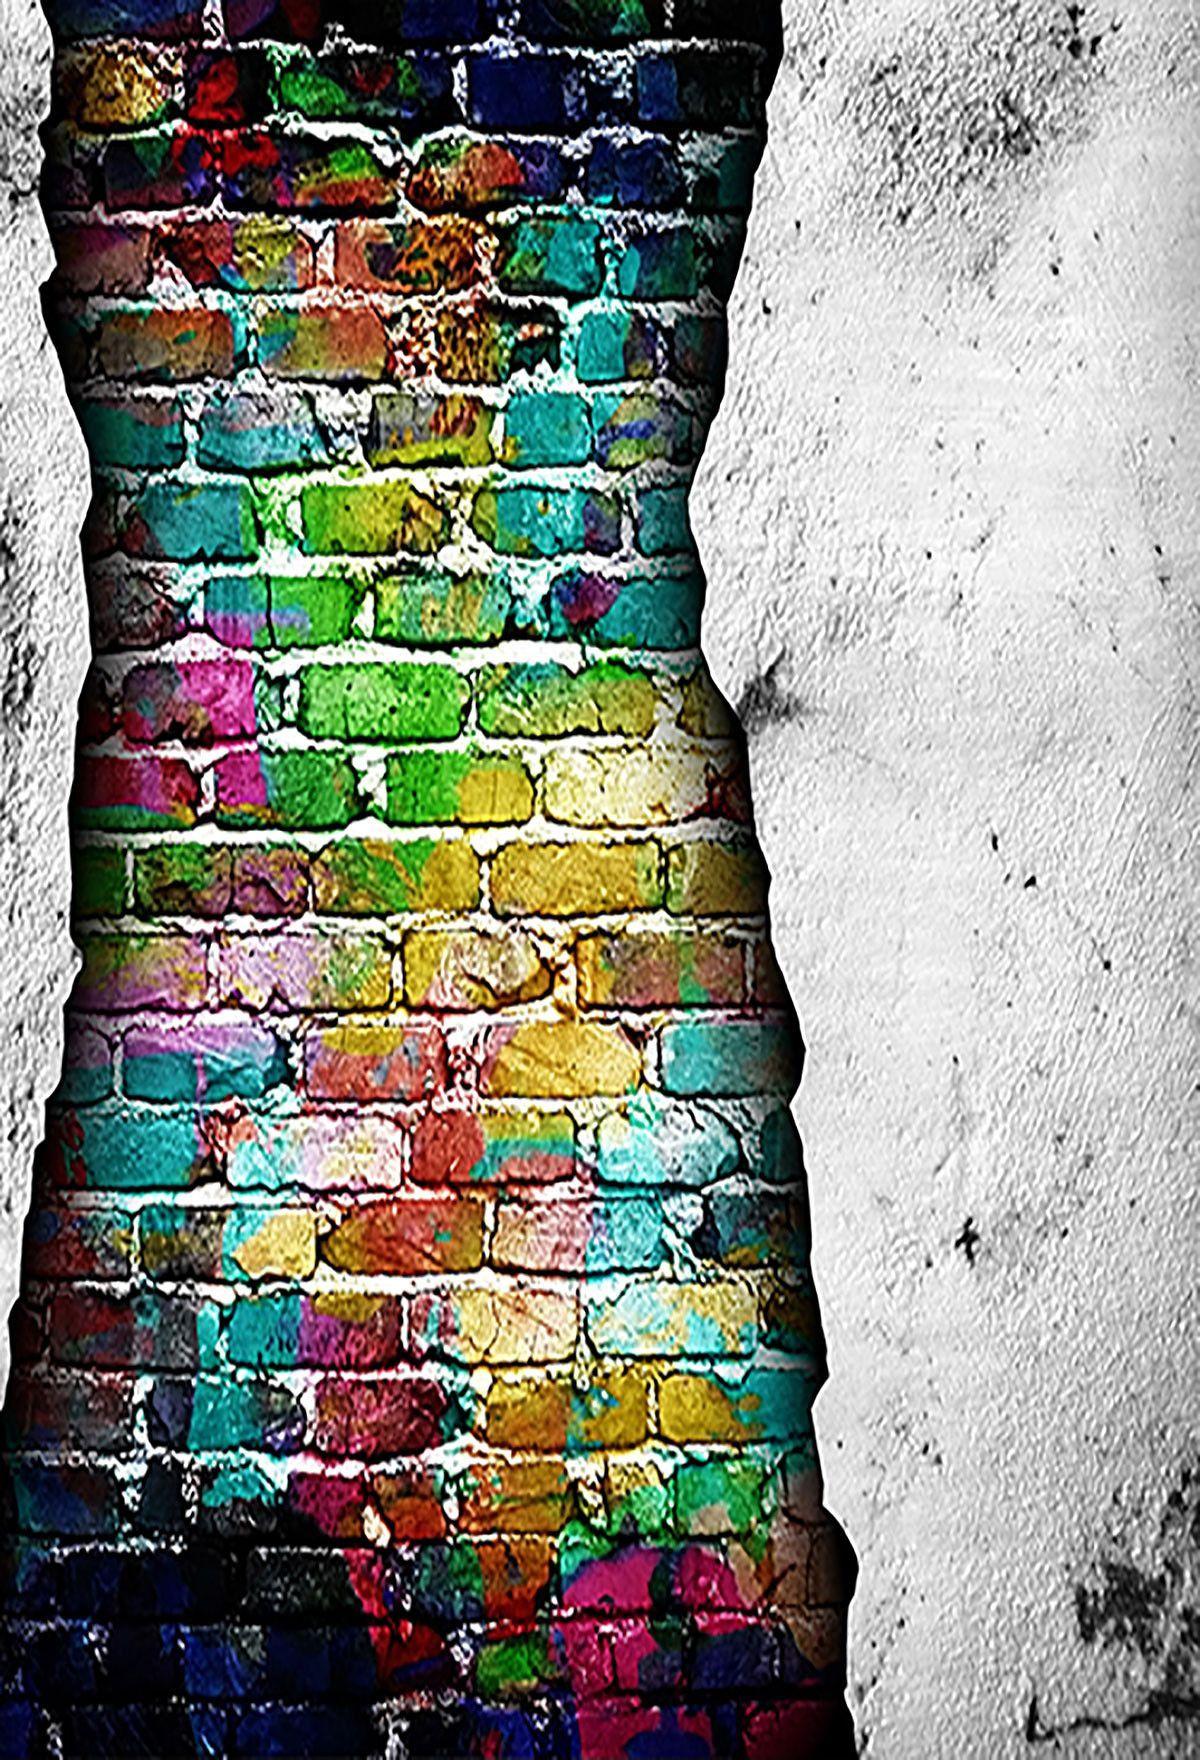 Brick wall backdrop diy photography background flower